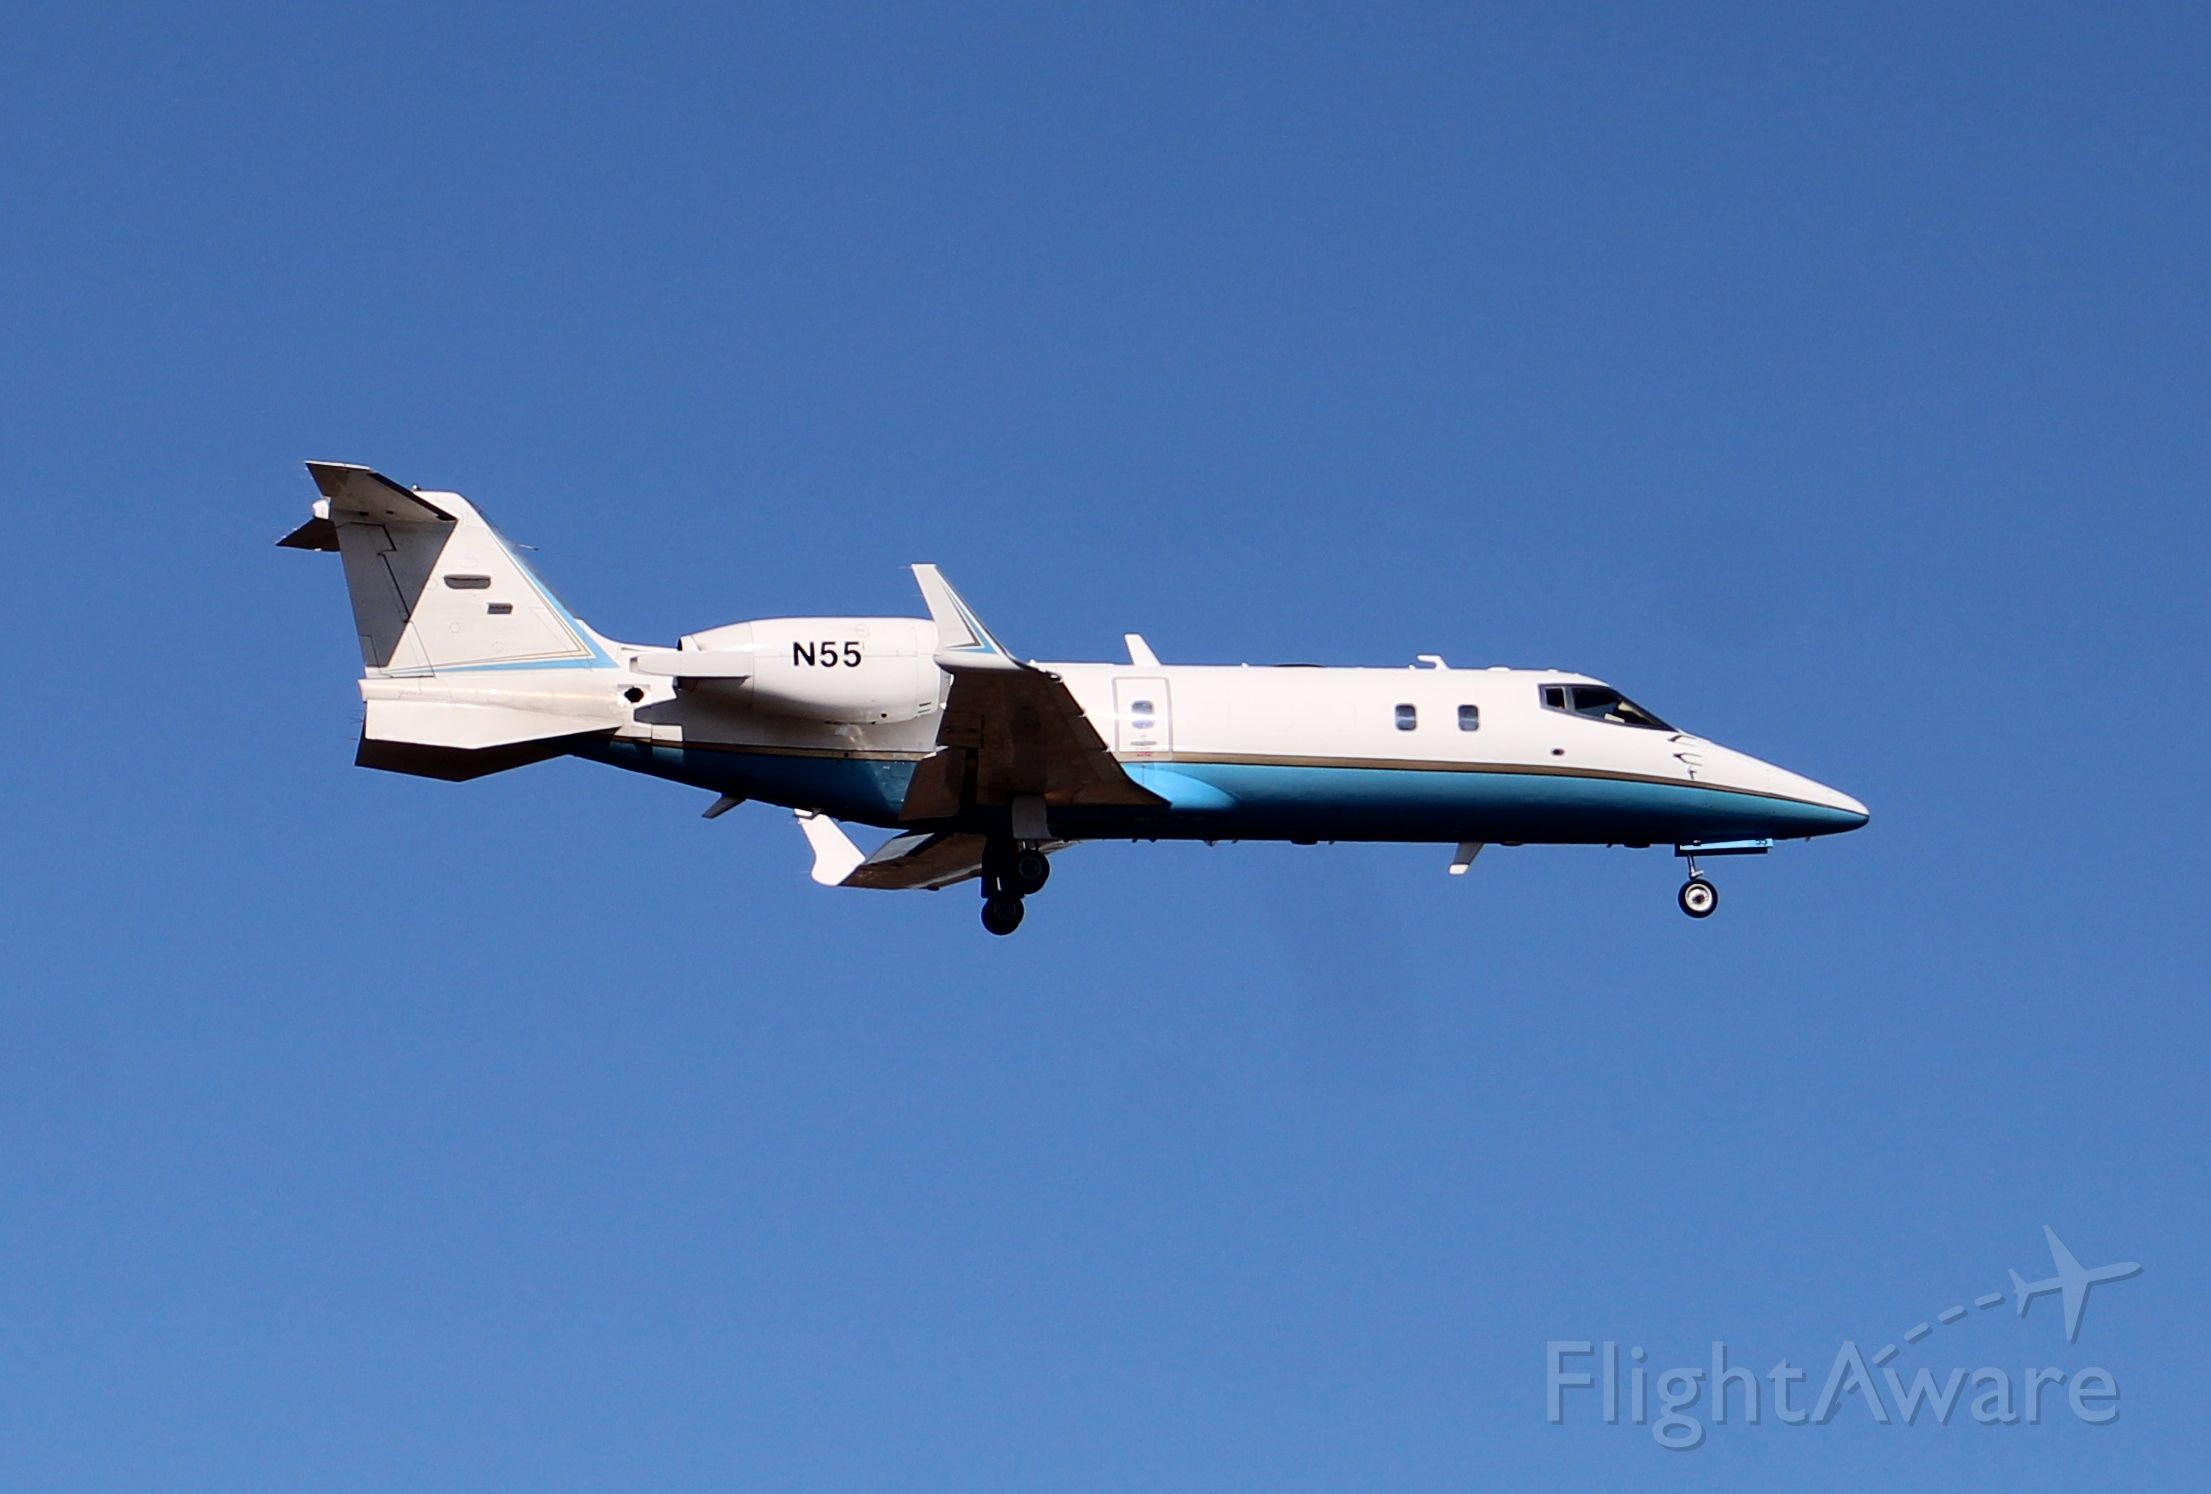 Learjet 60 (N55) - A Learjet 60 passing low and slow down the runway at Thomas J. Brumlik Field, Albertville Regional Airport, AL - February 15, 2017.